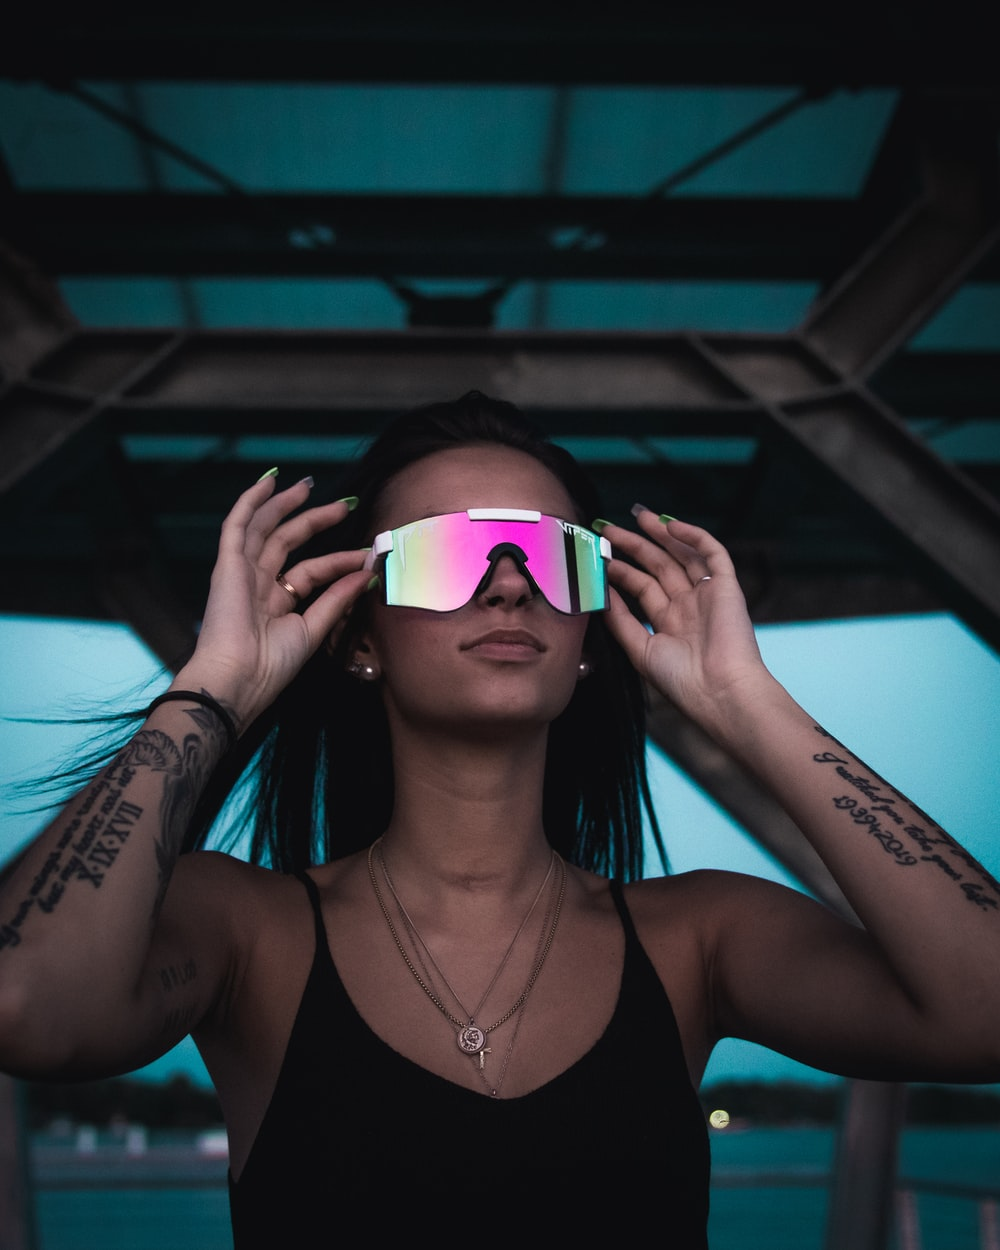 woman in black tank top wearing pink framed sunglasses